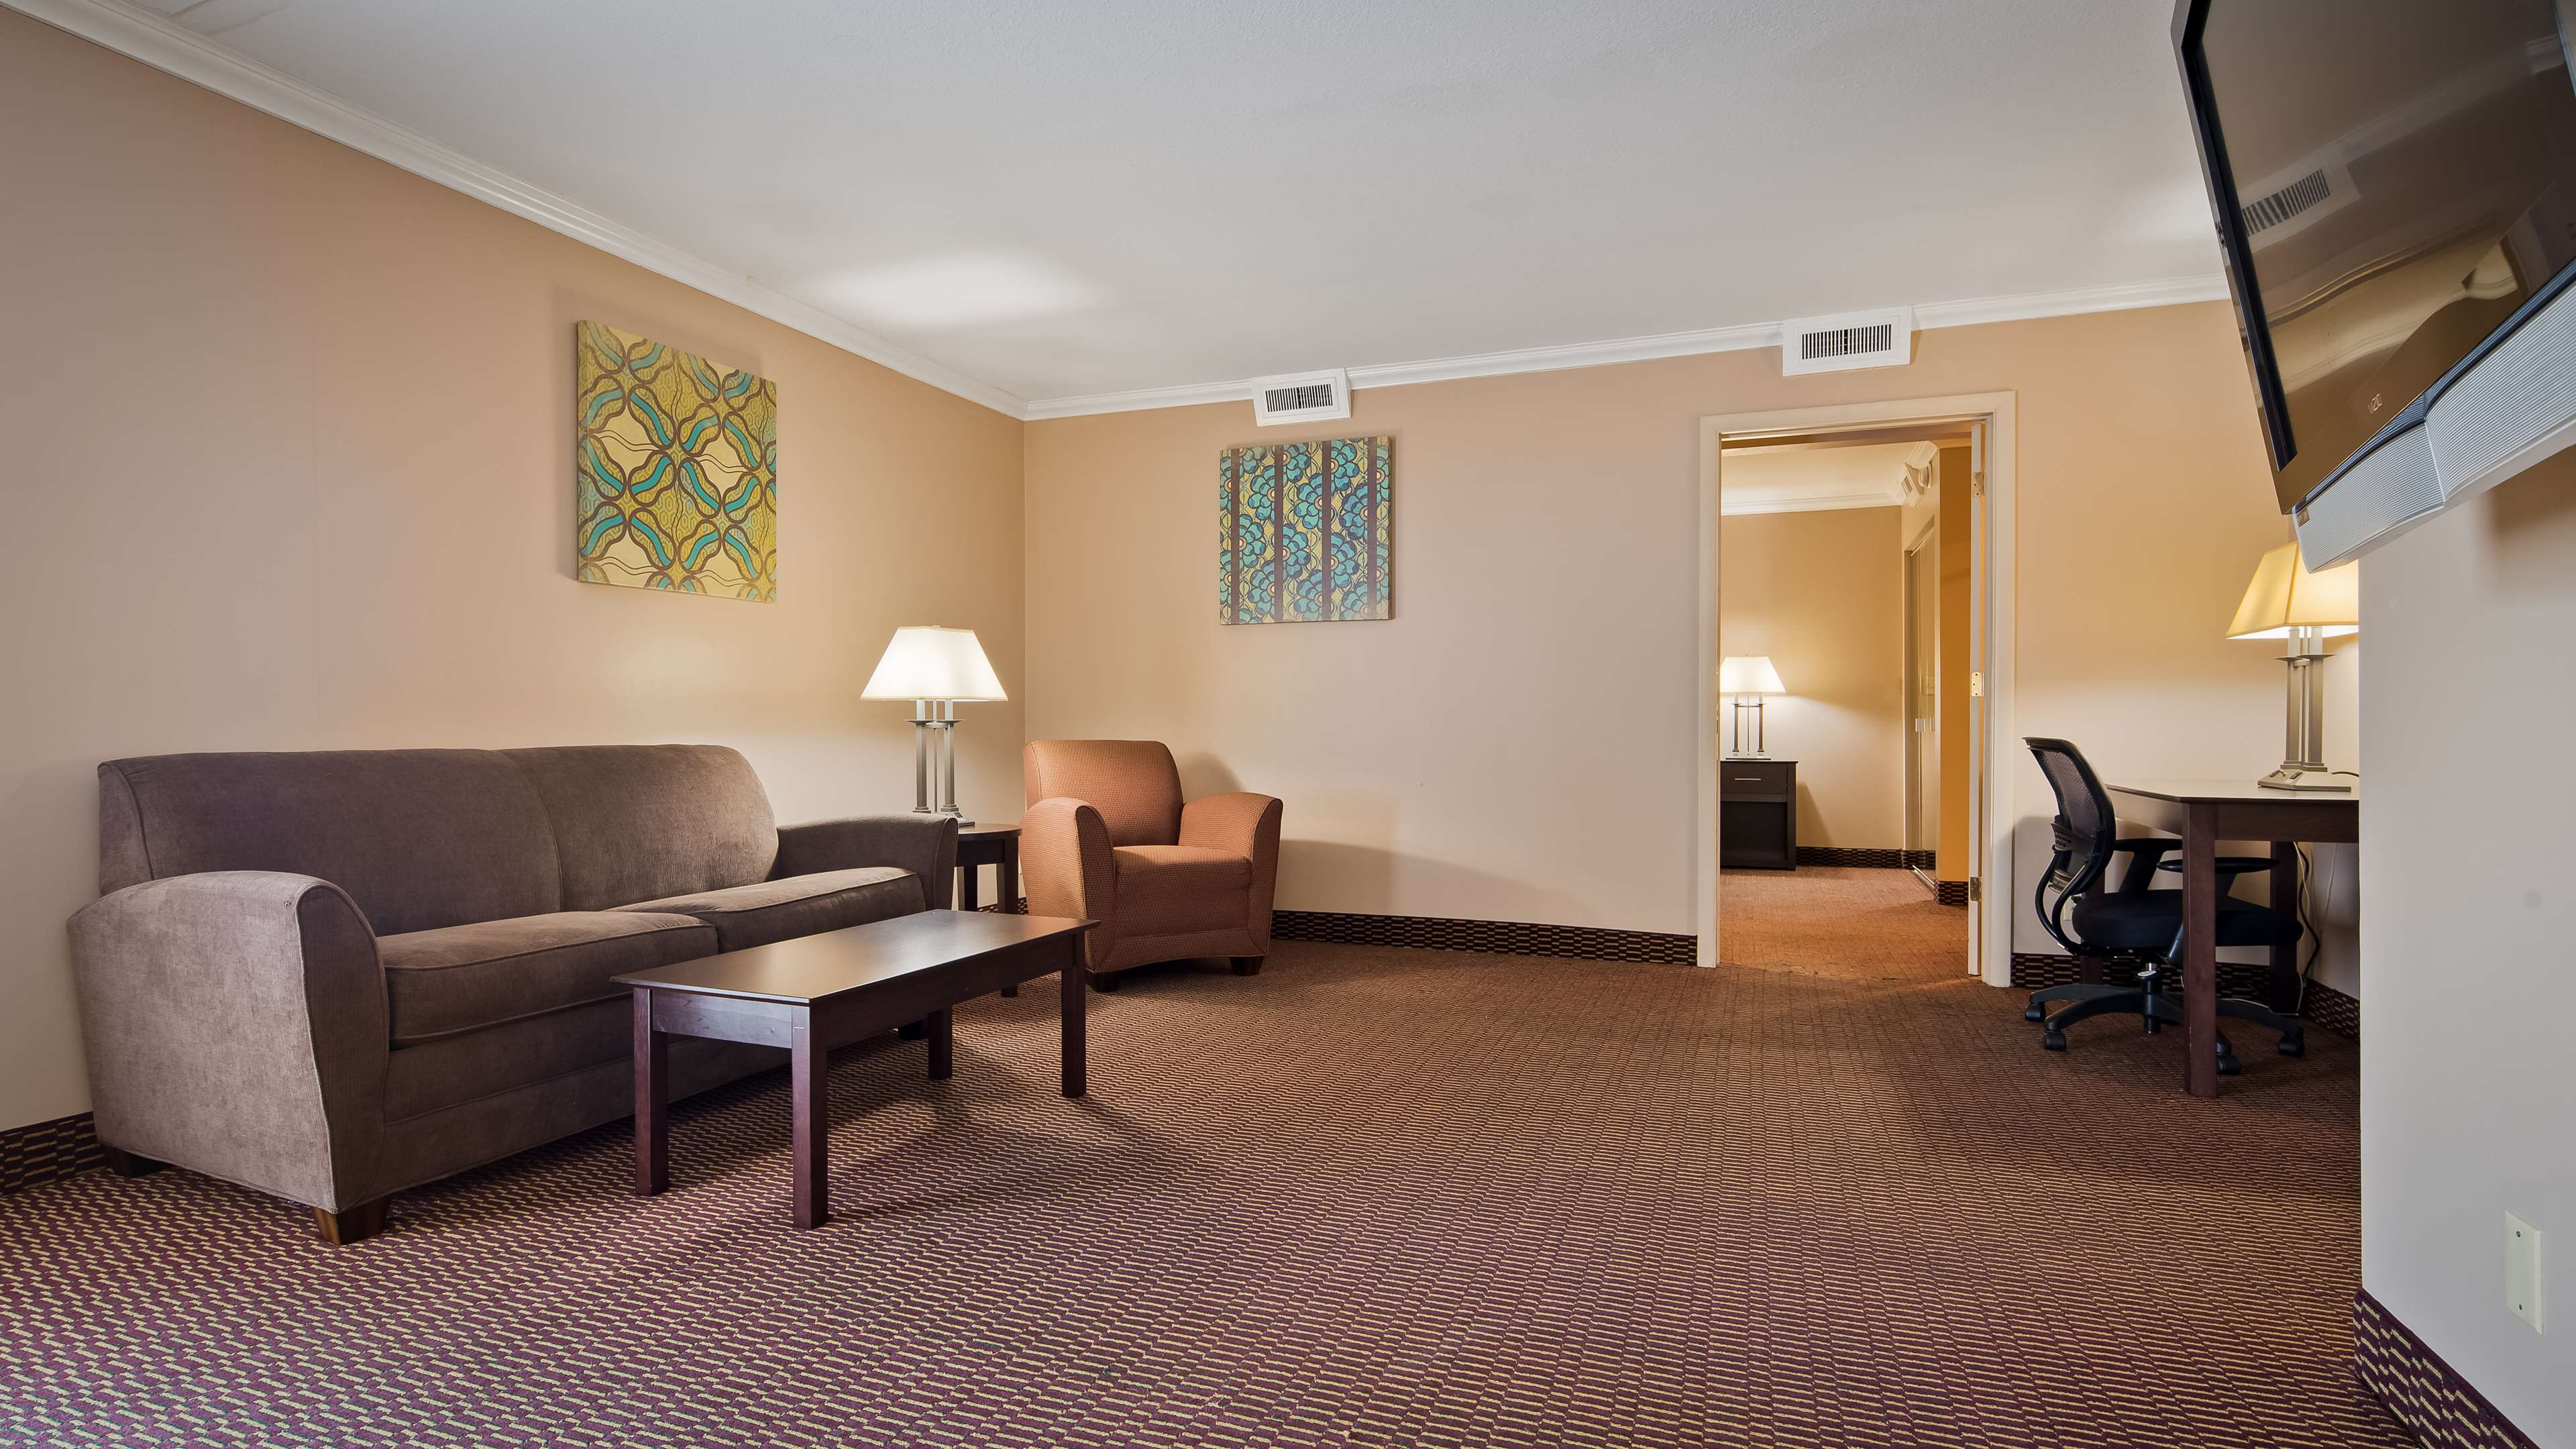 Best Western Valley Plaza Inn image 16